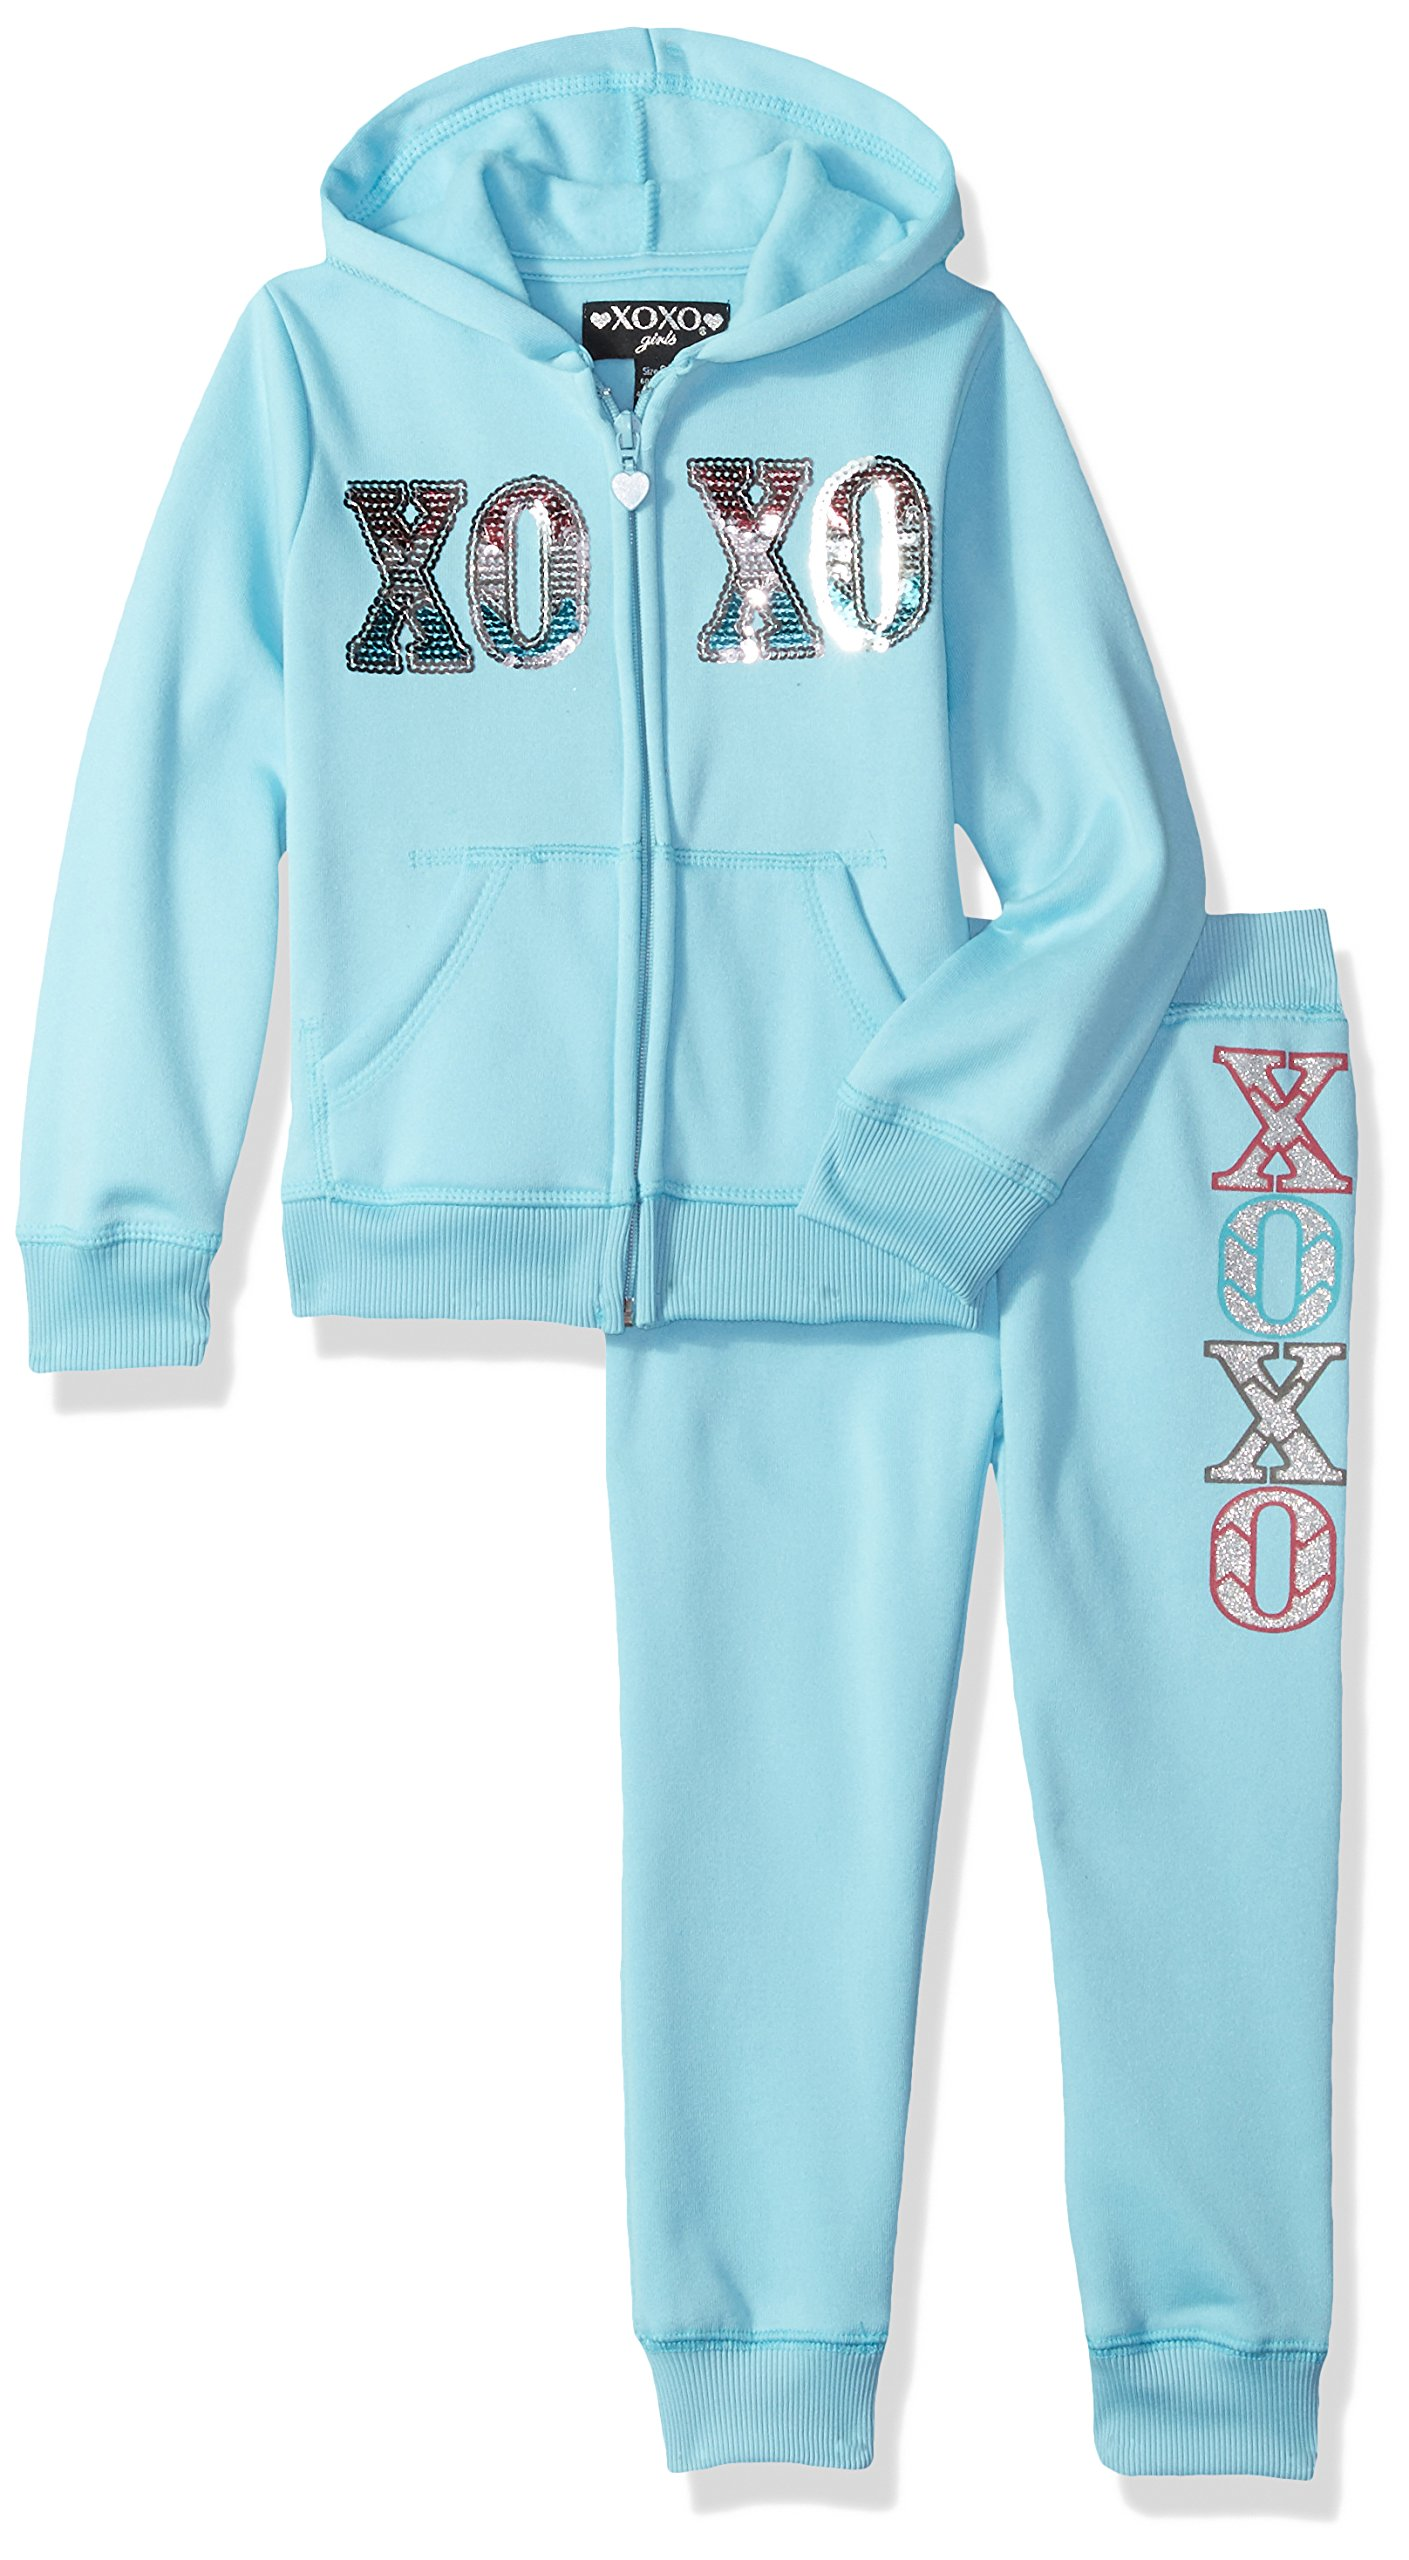 XOXO Little Girls' Hoodie and Jogger Set, Aqua Cone, 4